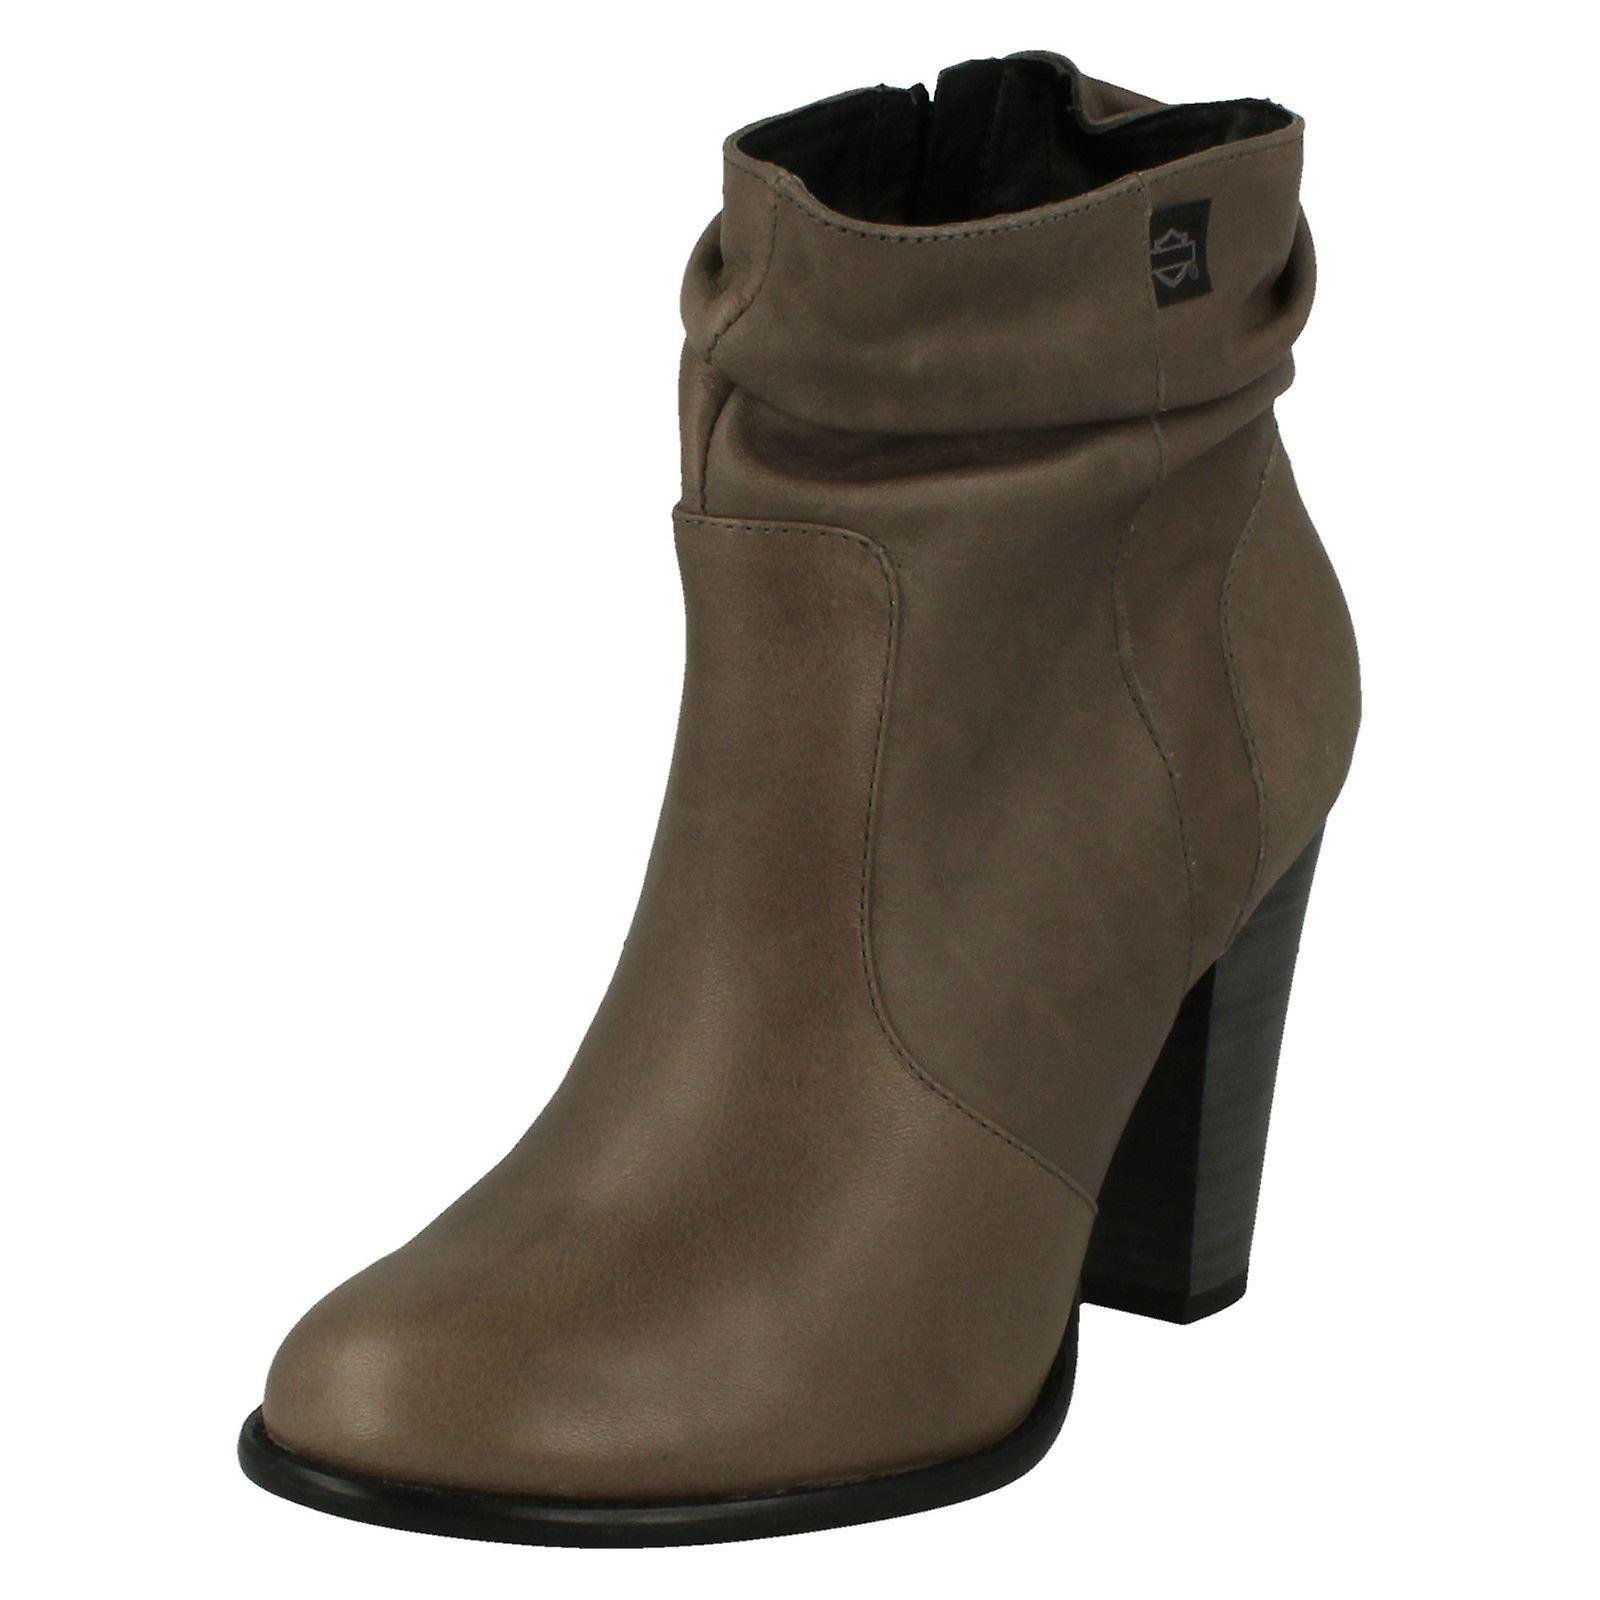 4cb2b865f4d3f Ladies Harley Davidson Heeled Ankle Boots Stone Brook - Grey Scrunch  Leather - UK Size 4 - EU Size 37 - US Size 6